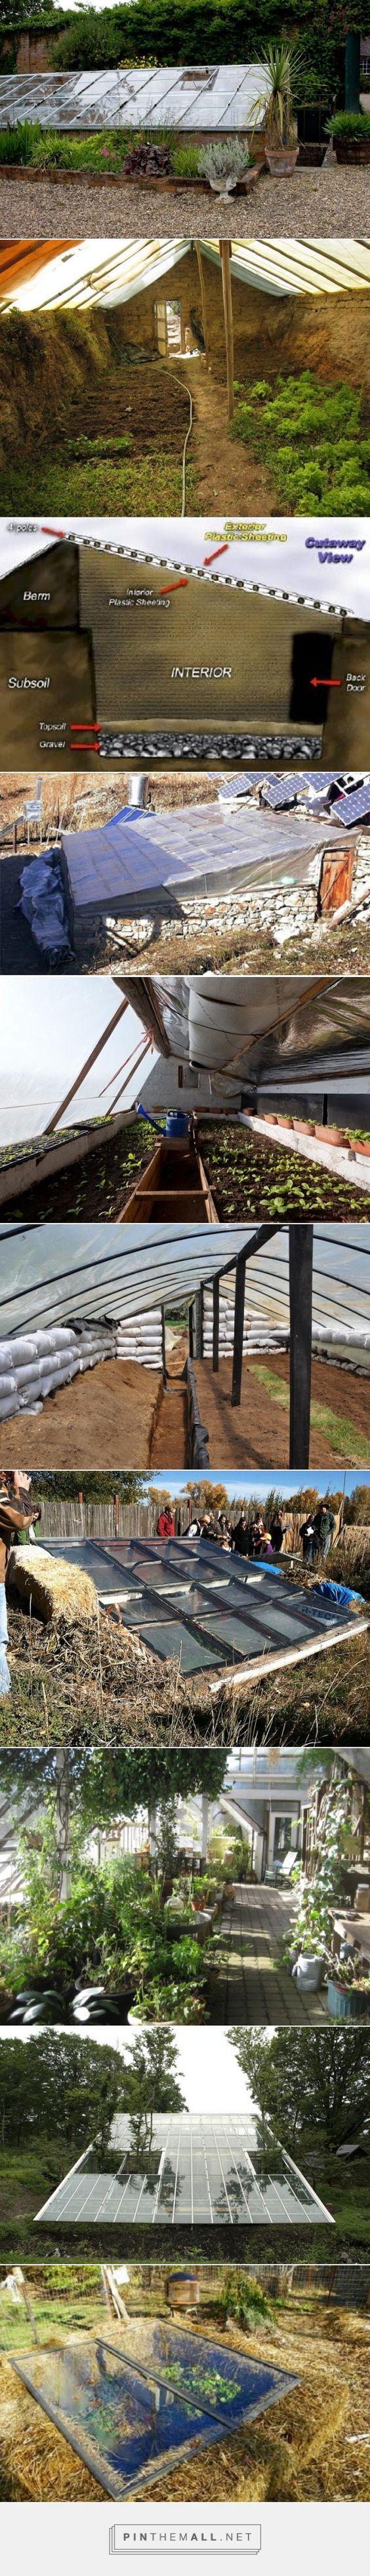 Walipini: Pit Greenhouses